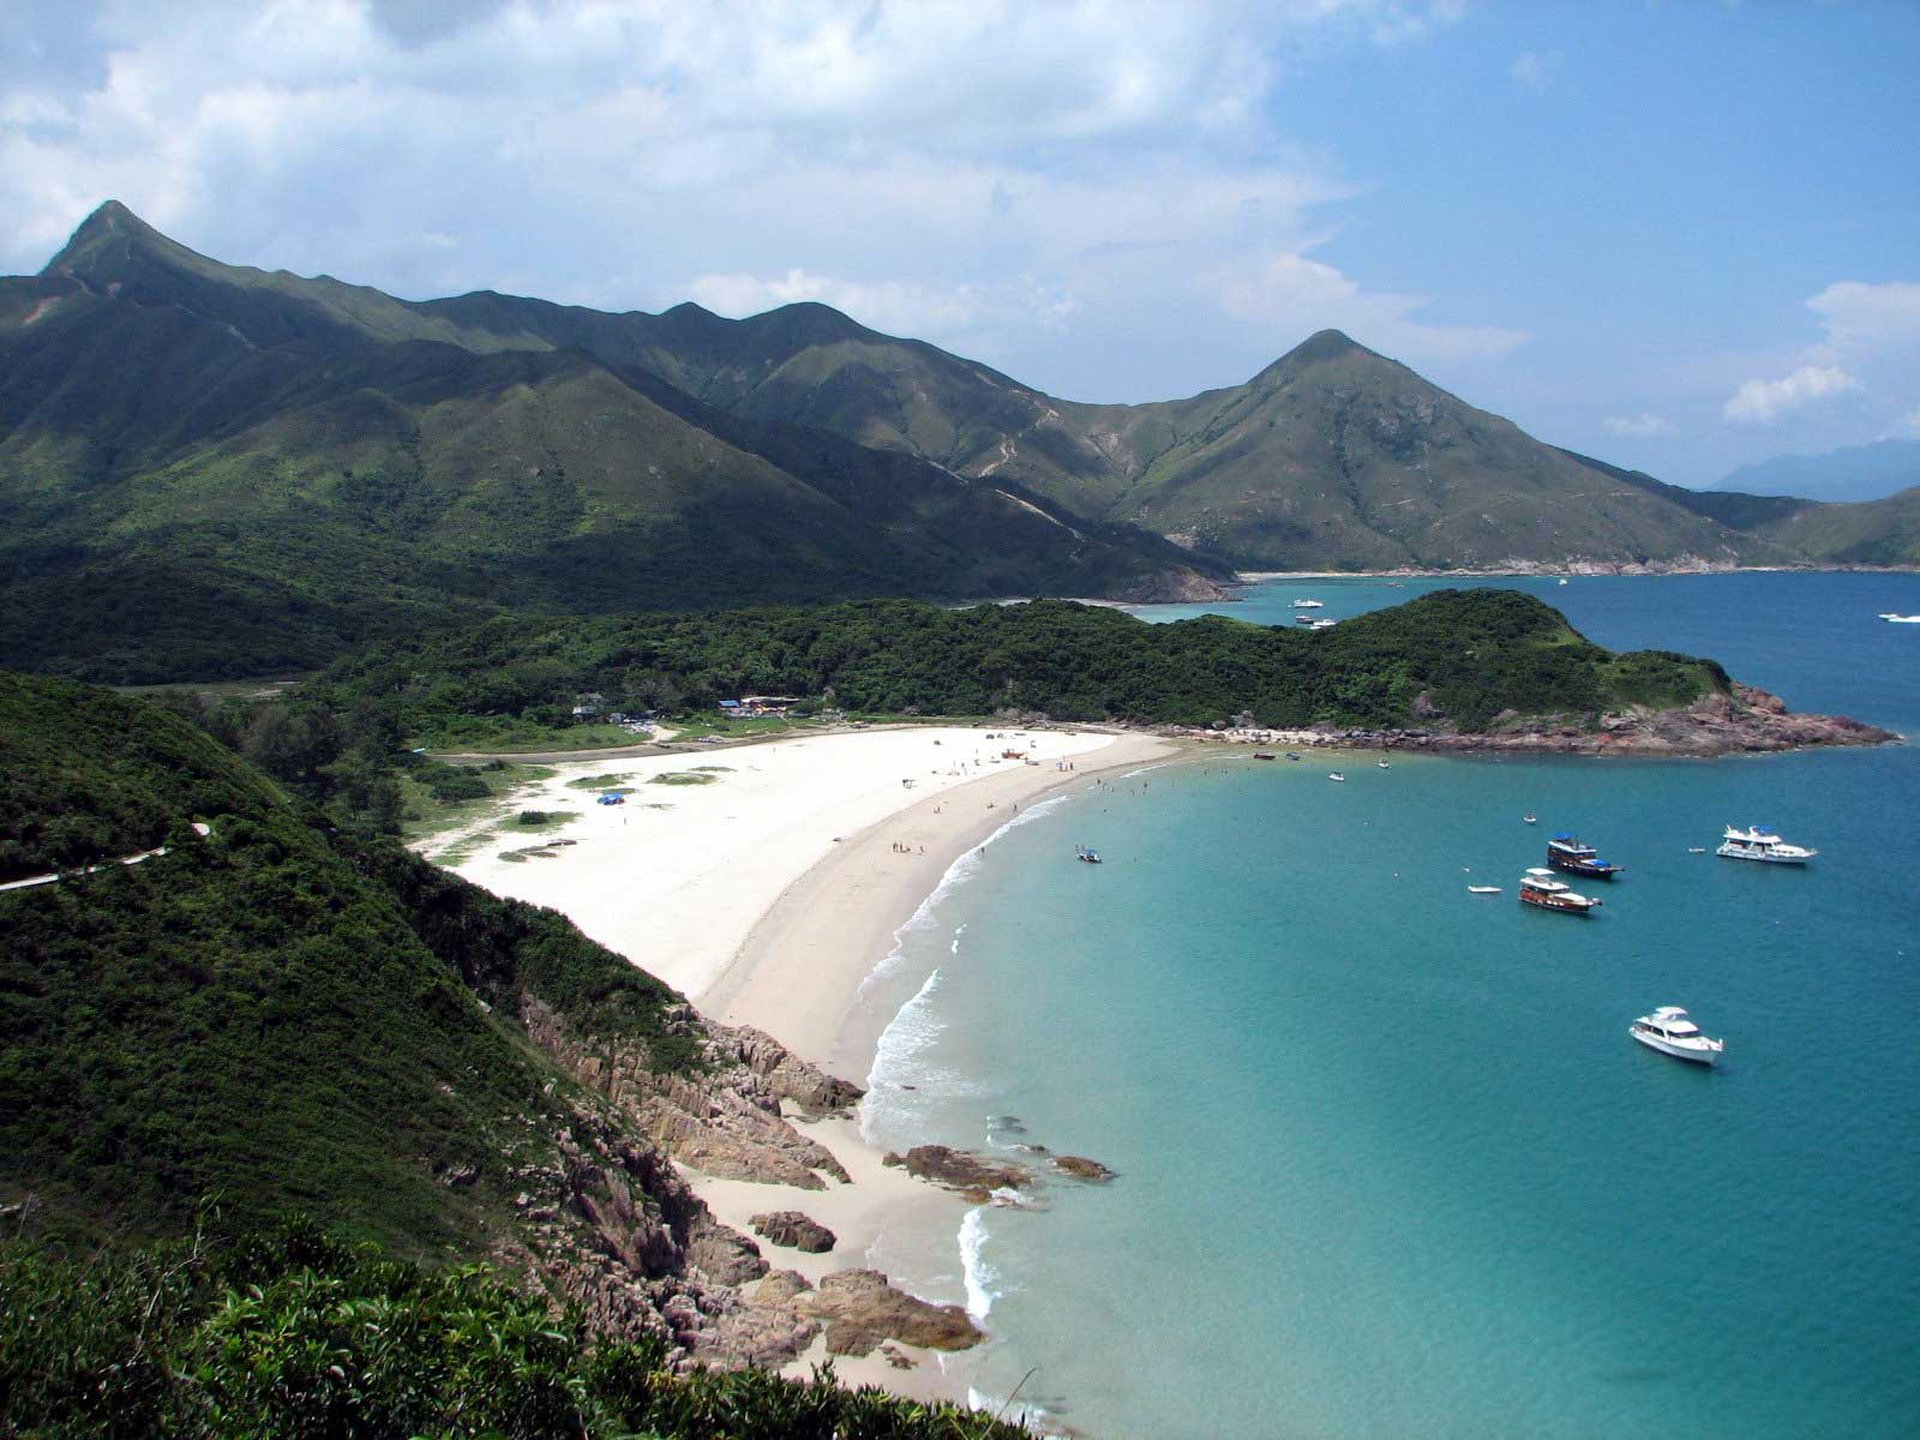 Vịnh Sai Wan